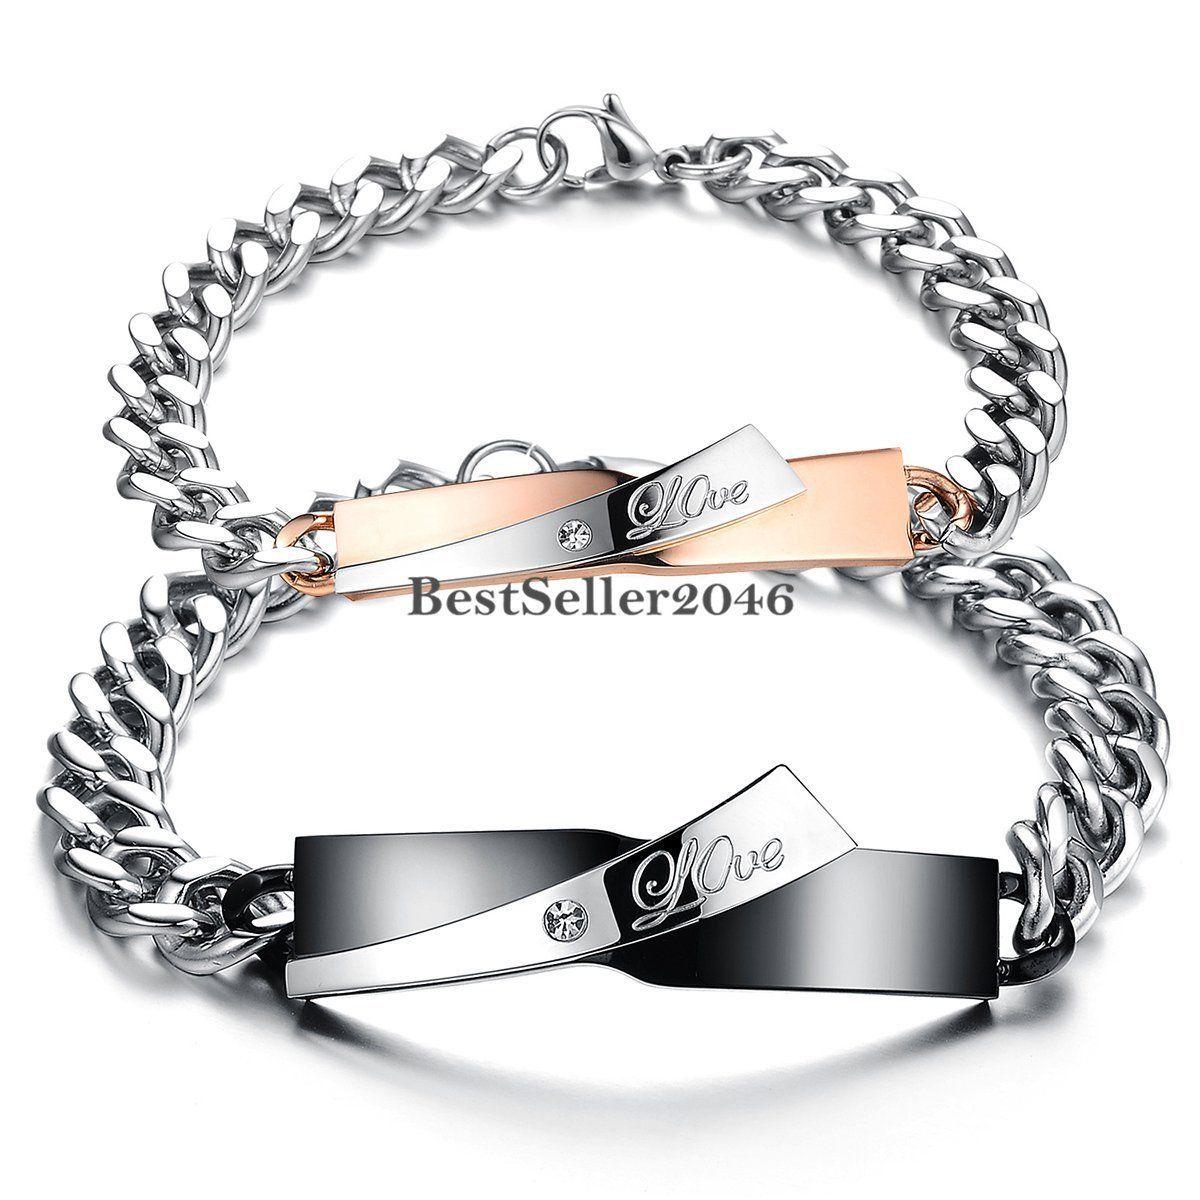 Coupleus stainless steel curb cuban chain